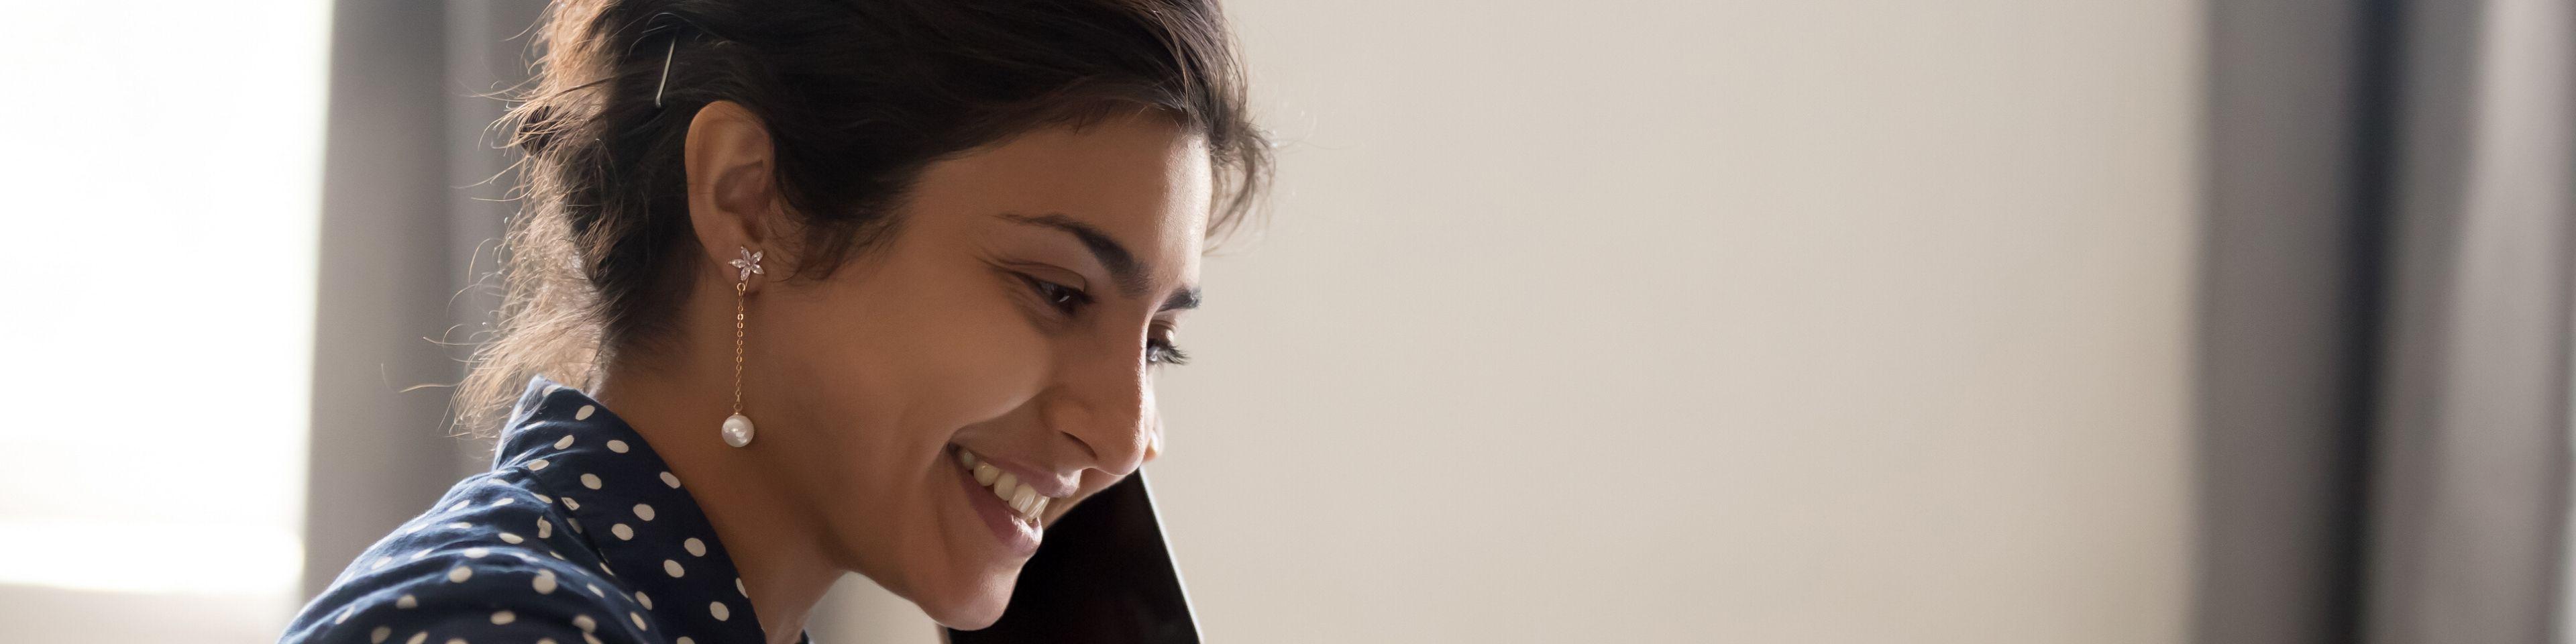 Smiling-employee-working-on-laptop-talking-over-phone